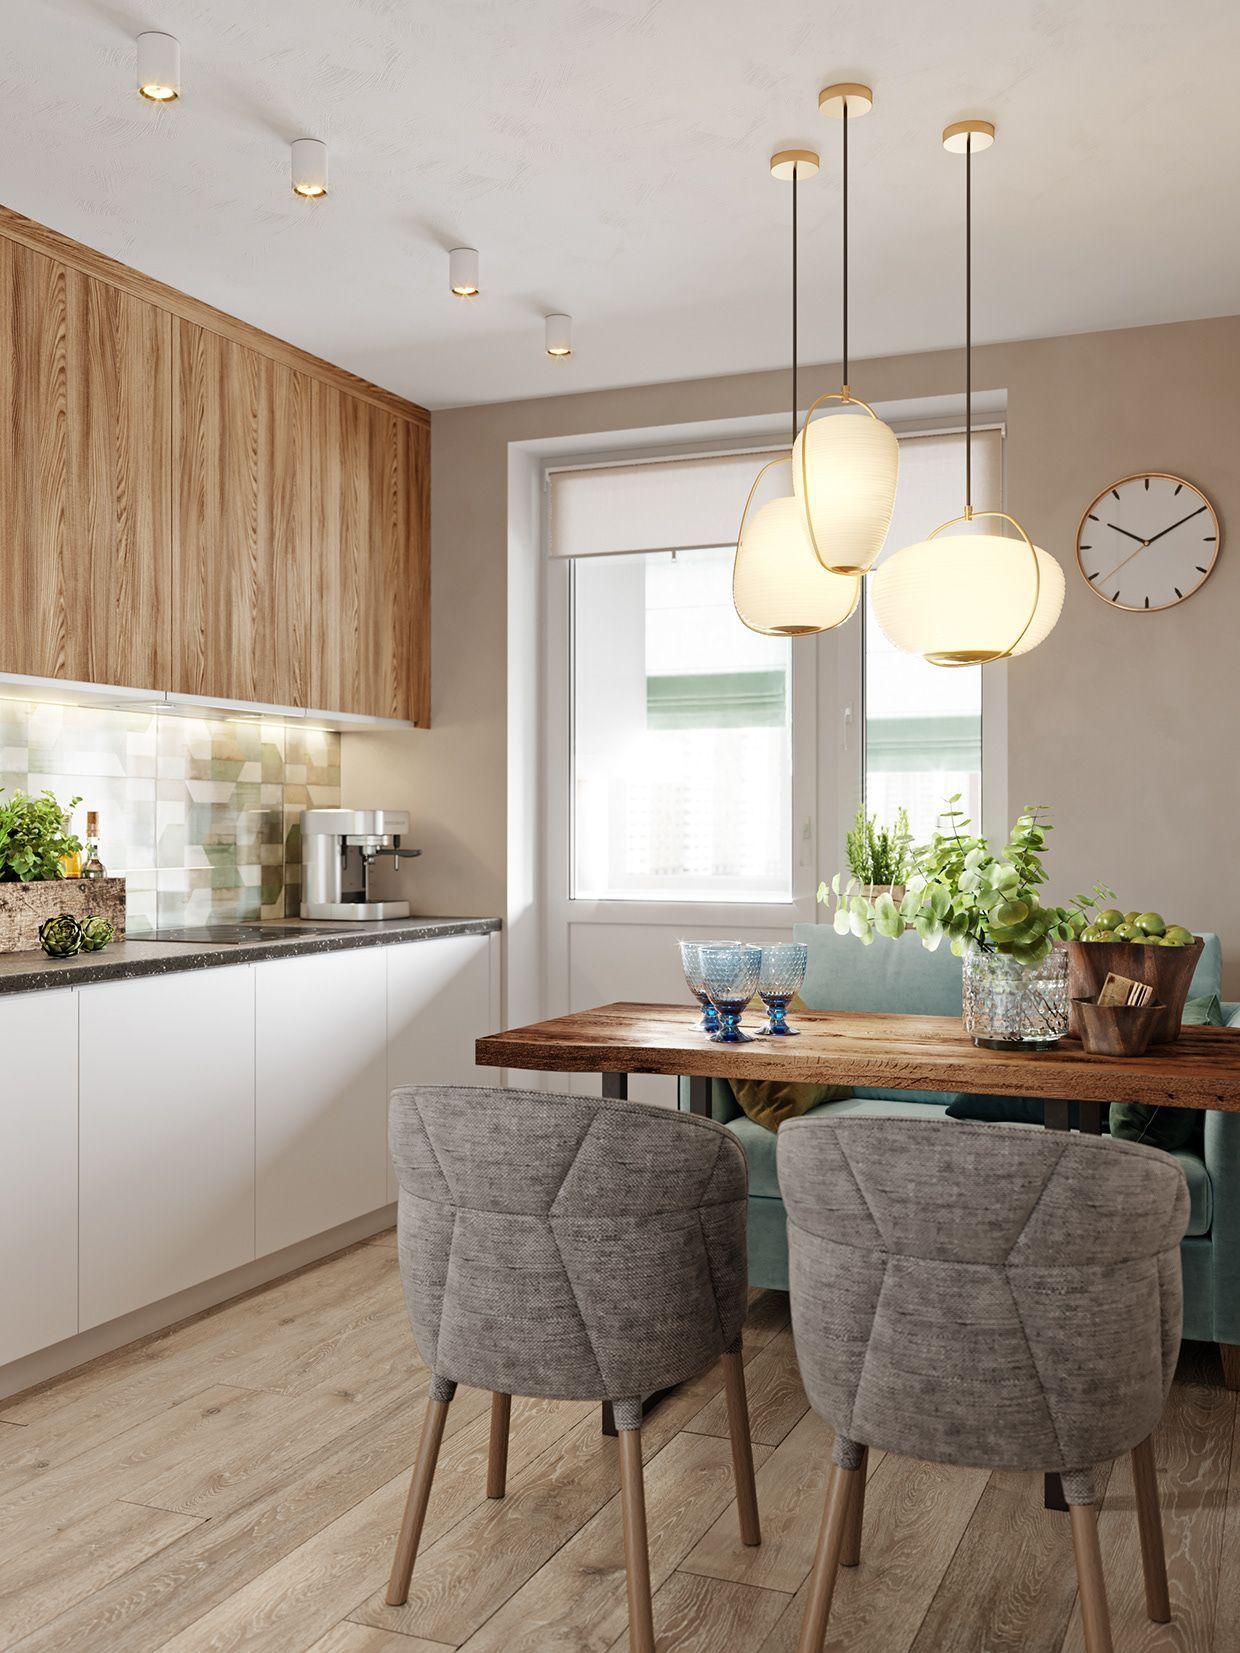 17 Minimalist Home Interior Design Ideas: 17+ Breathtaking Minimalist Interior Ideas Ideas в 2019 г